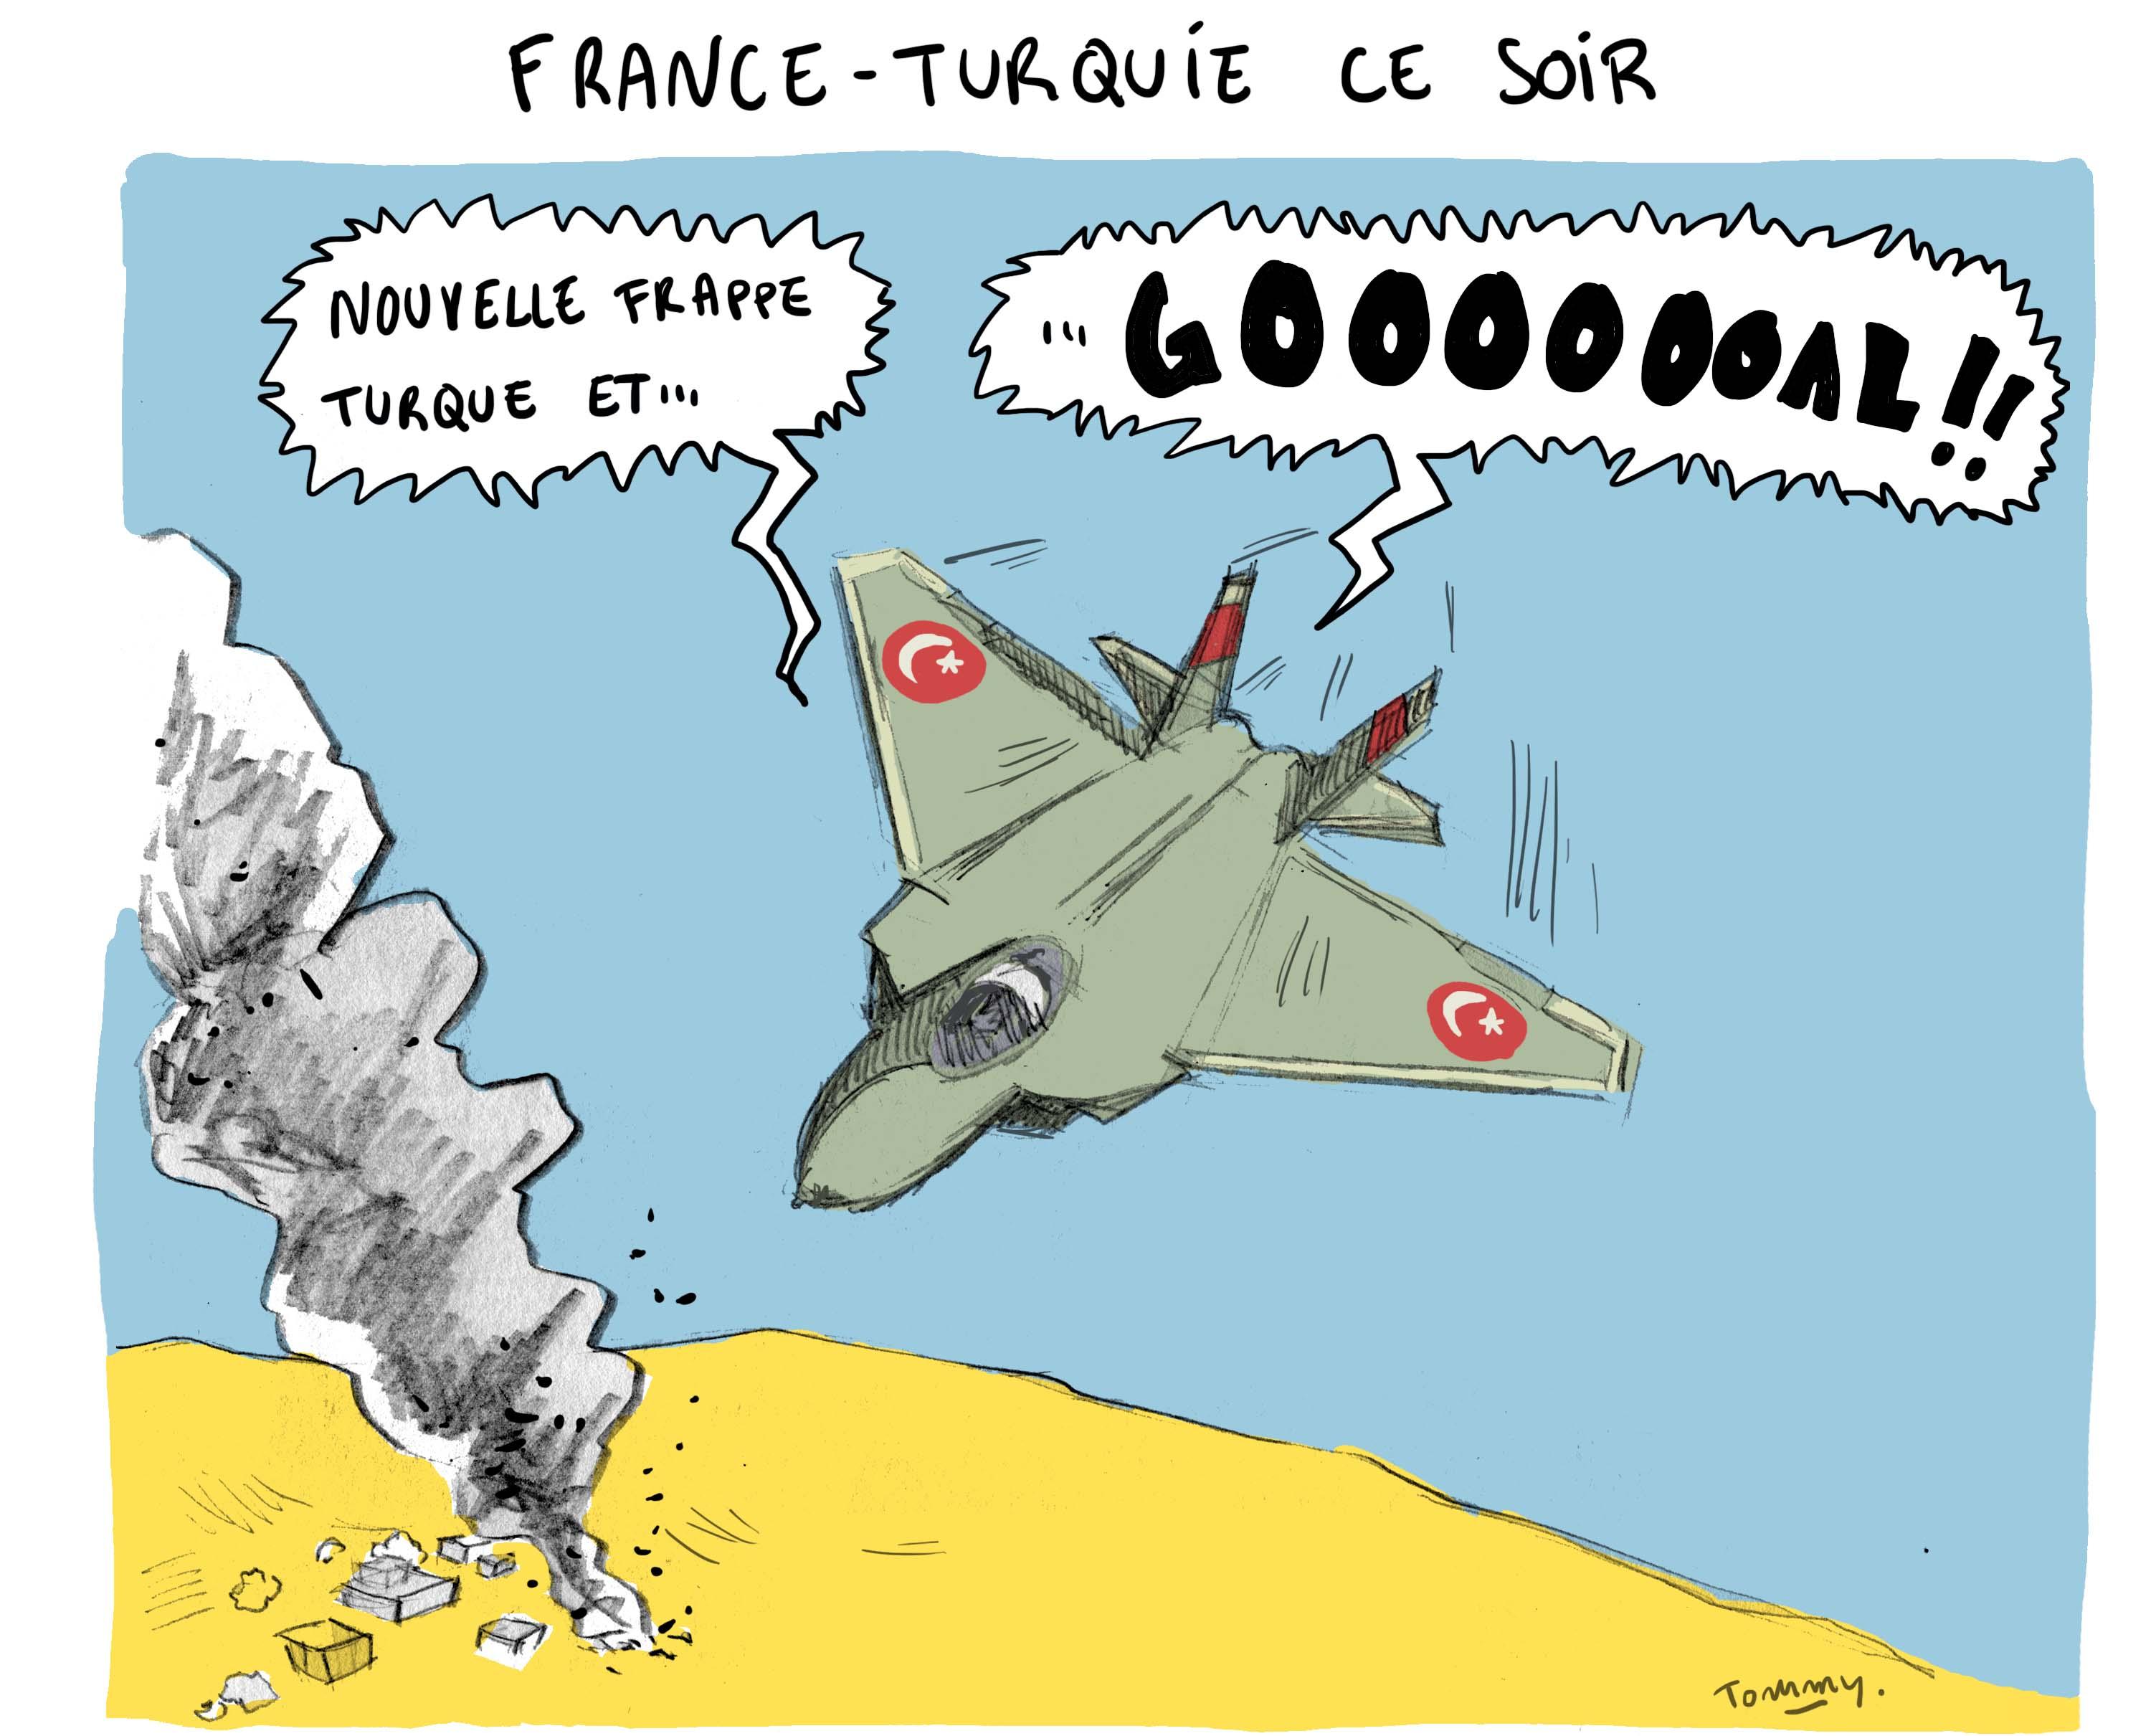 France-Turquie